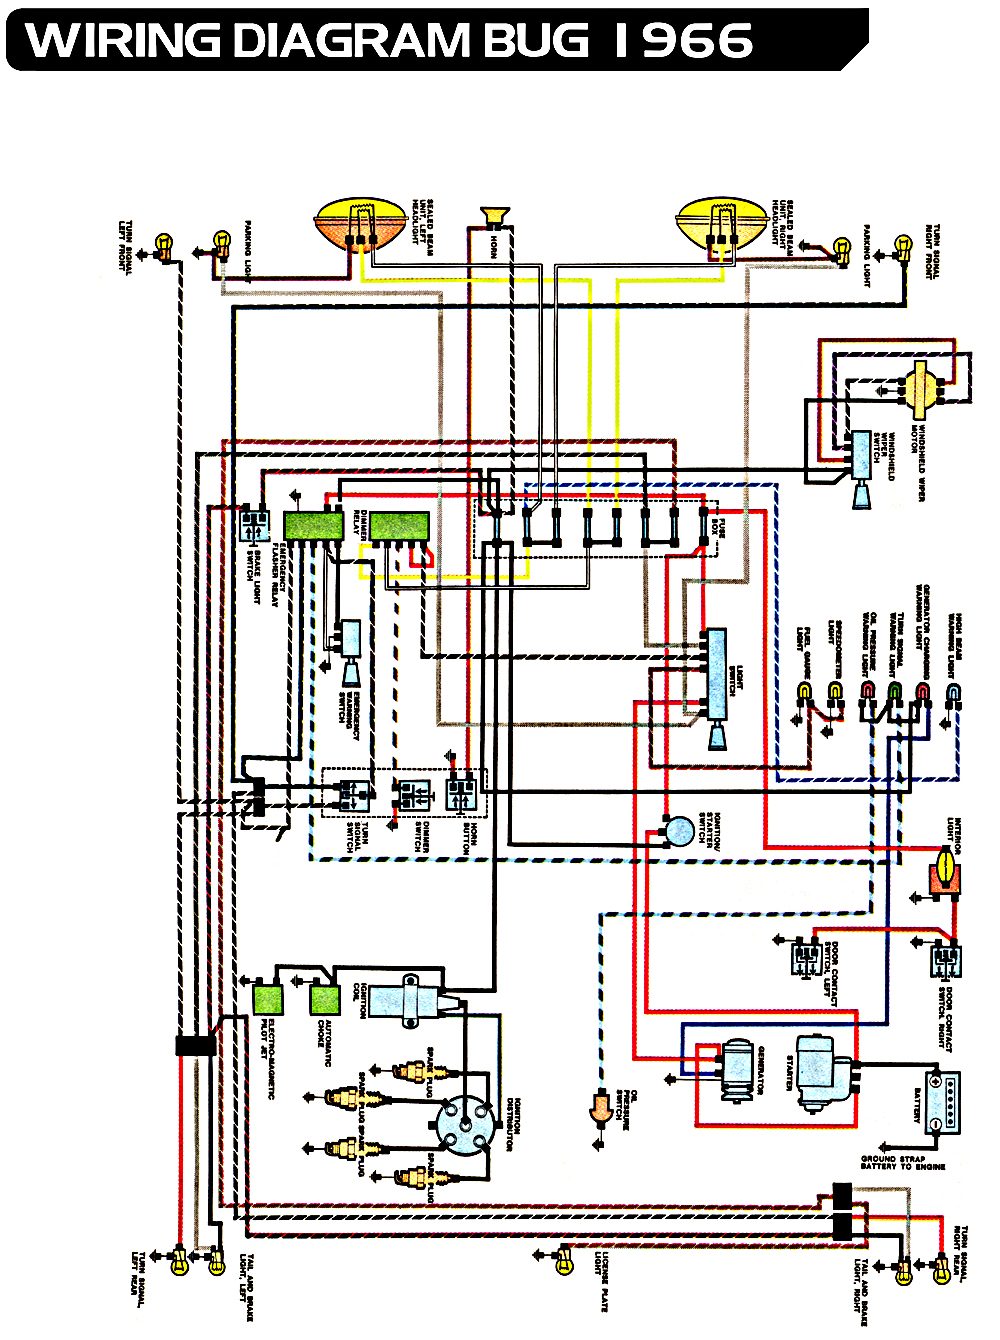 TM_8330] International Loadstar 1600 Wiring Diagrams On Ih 1086 Wiring  Diagram Download DiagramLave Vell Jebrp Mohammedshrine Librar Wiring 101